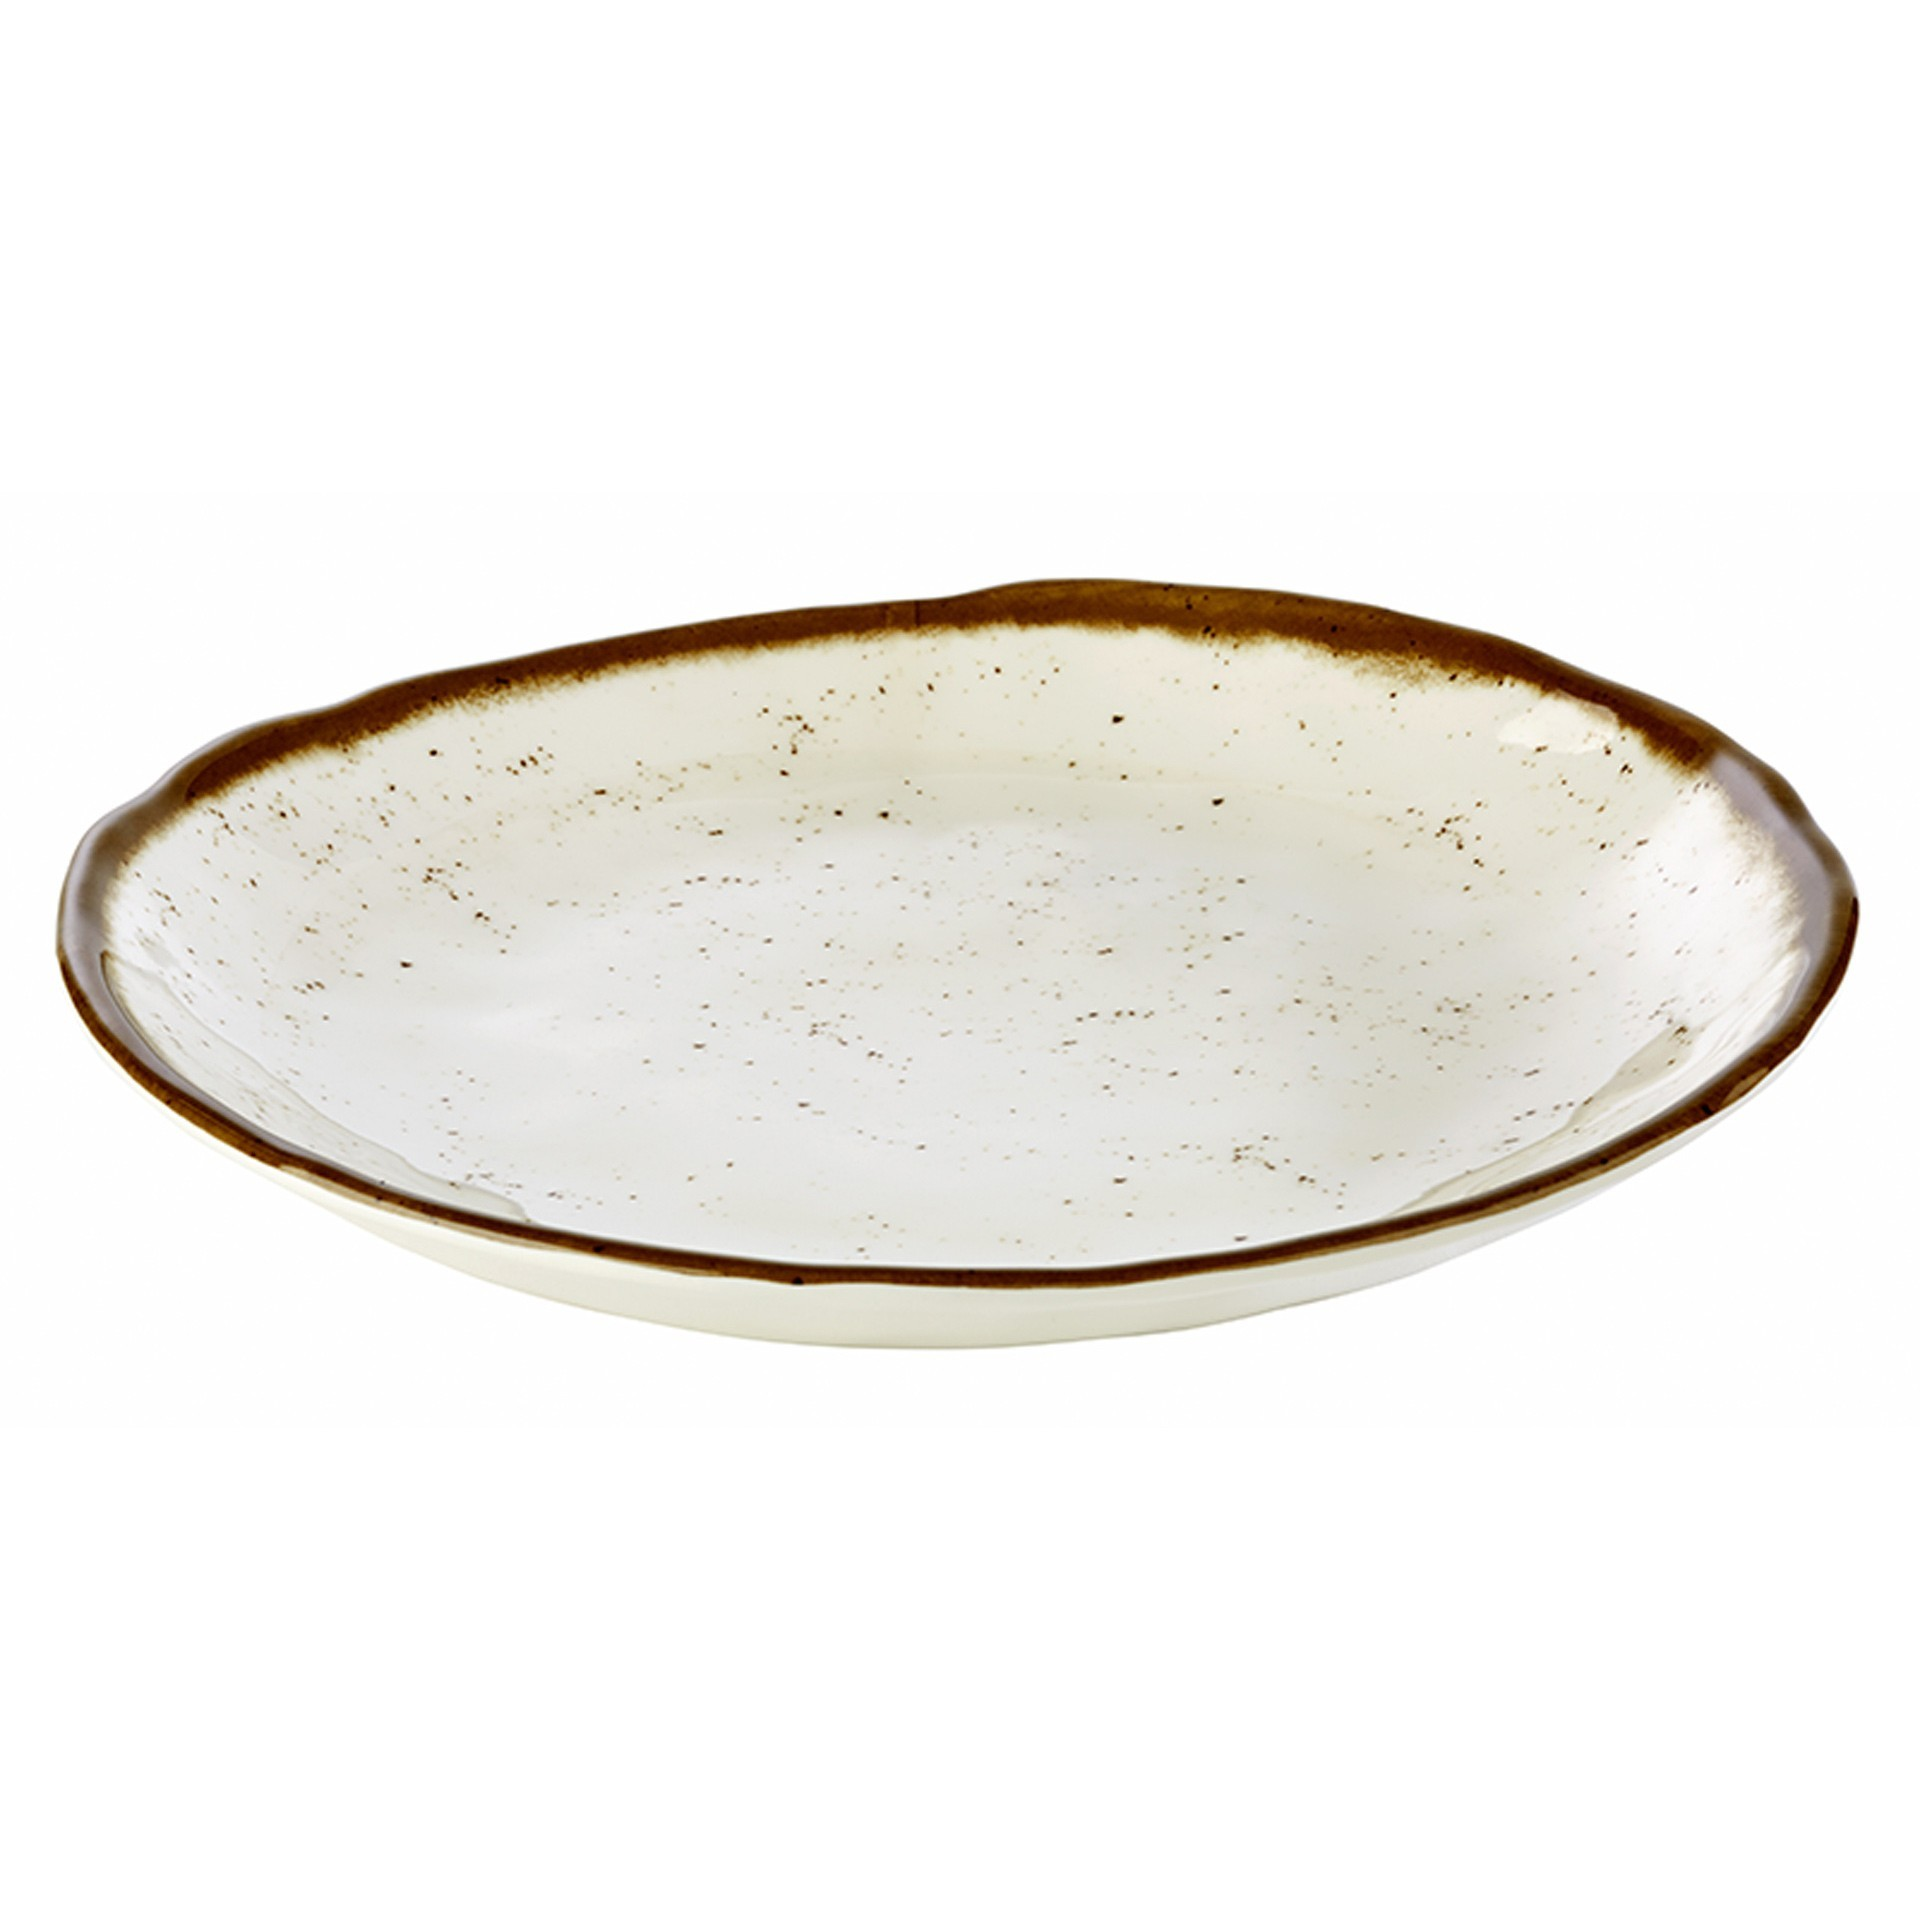 6 Porzellanschüssel Suppenteller Müslischüssel Porzellan Bunt Neu Stone Optik